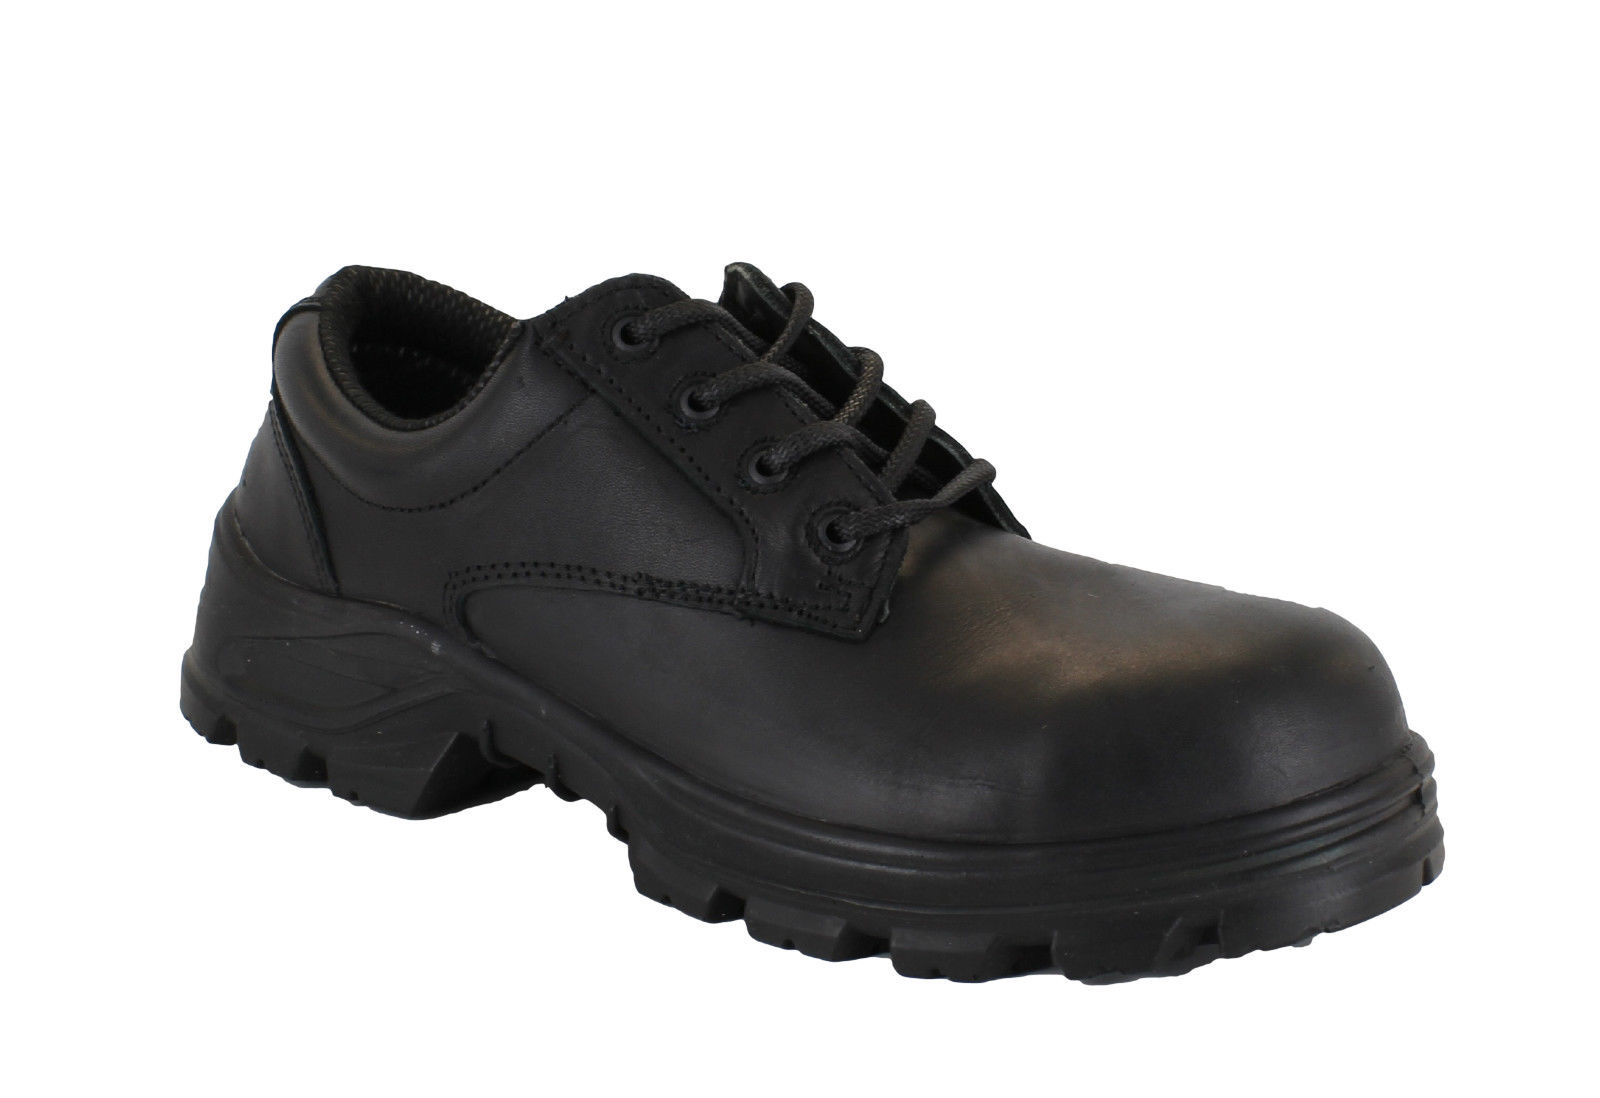 Terra Emerson S3 Mens Black Formal Smart Safety Composite Toe Shoes   EBay